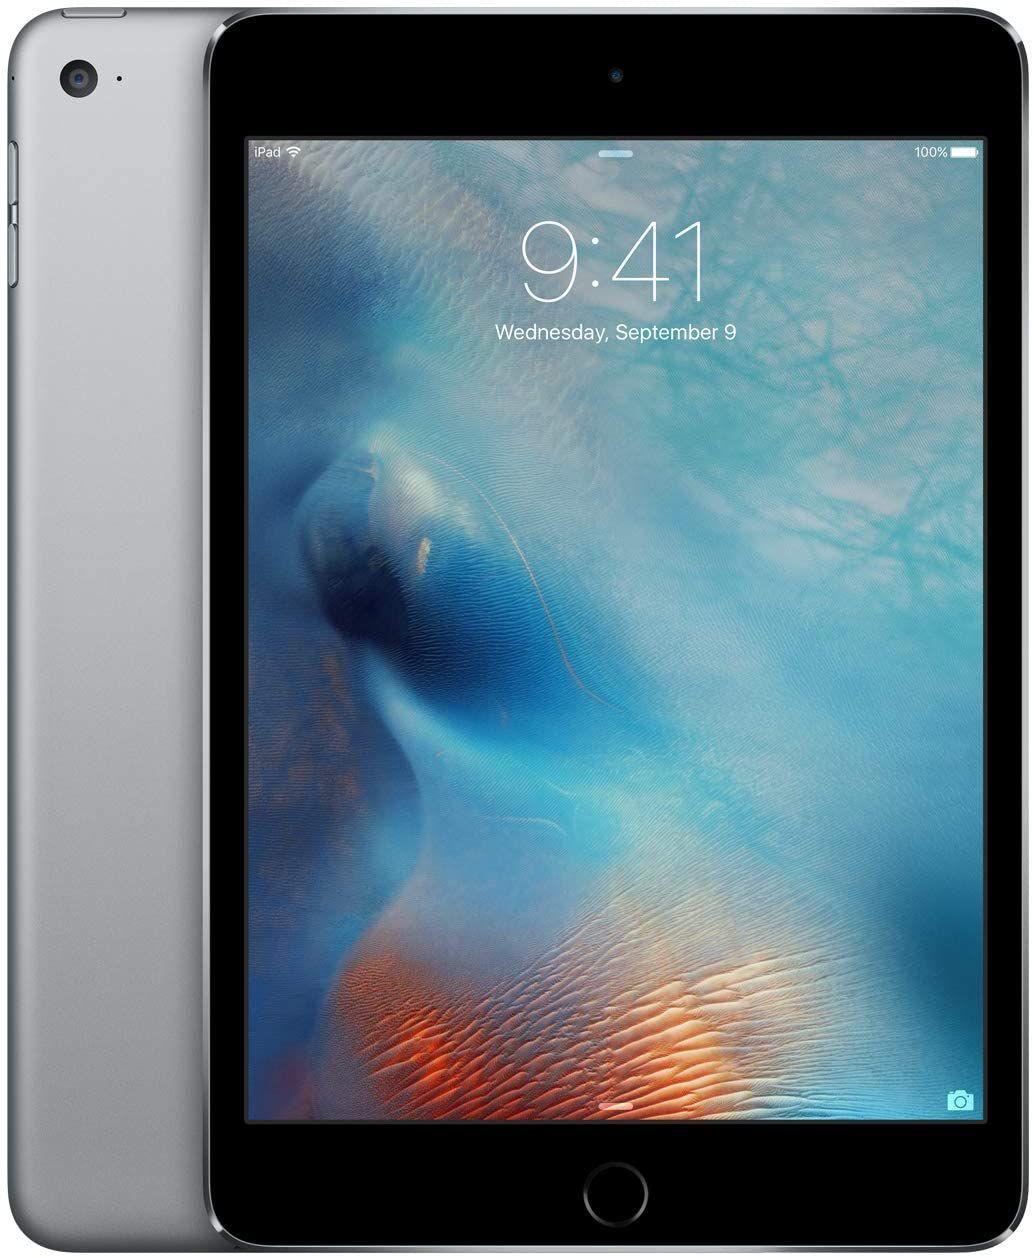 Apple iPad Mini 4 (Wi-Fi, 128GB) - Space Gray (Previous Model)